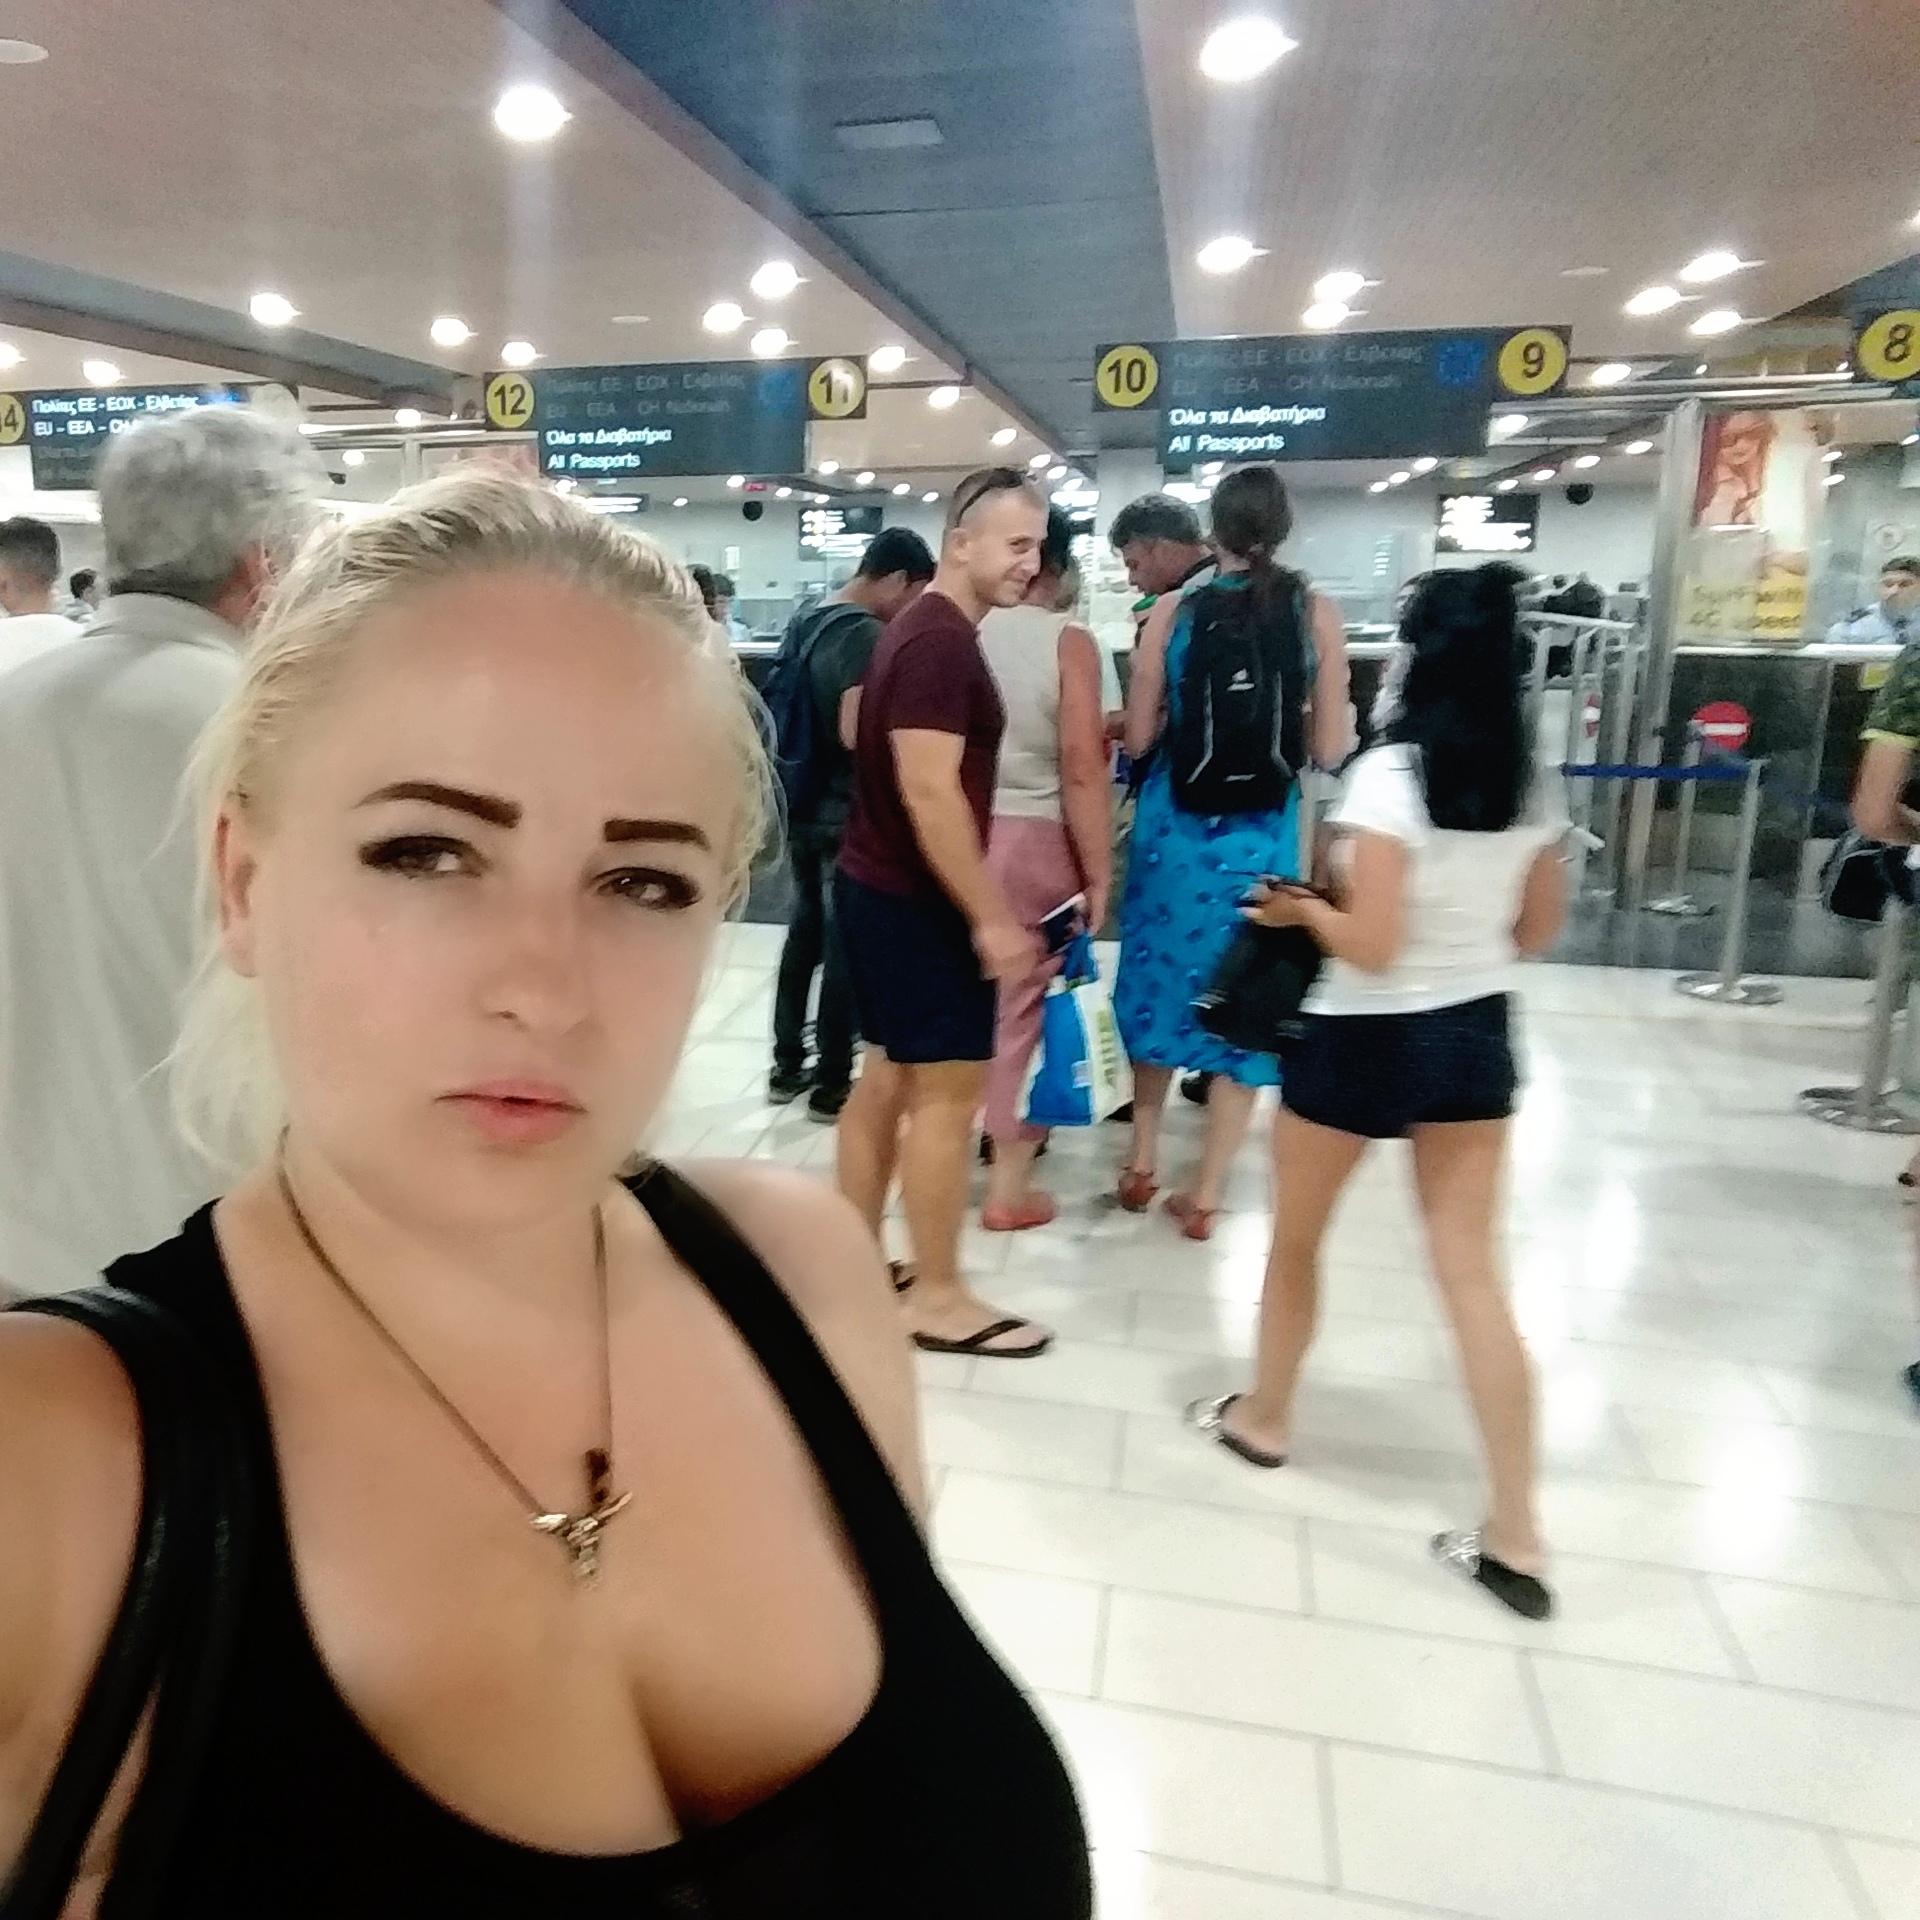 Елена Руденко (Валтея). Кипр. Айия-Напа (фото). TMvwvbaY9ZI